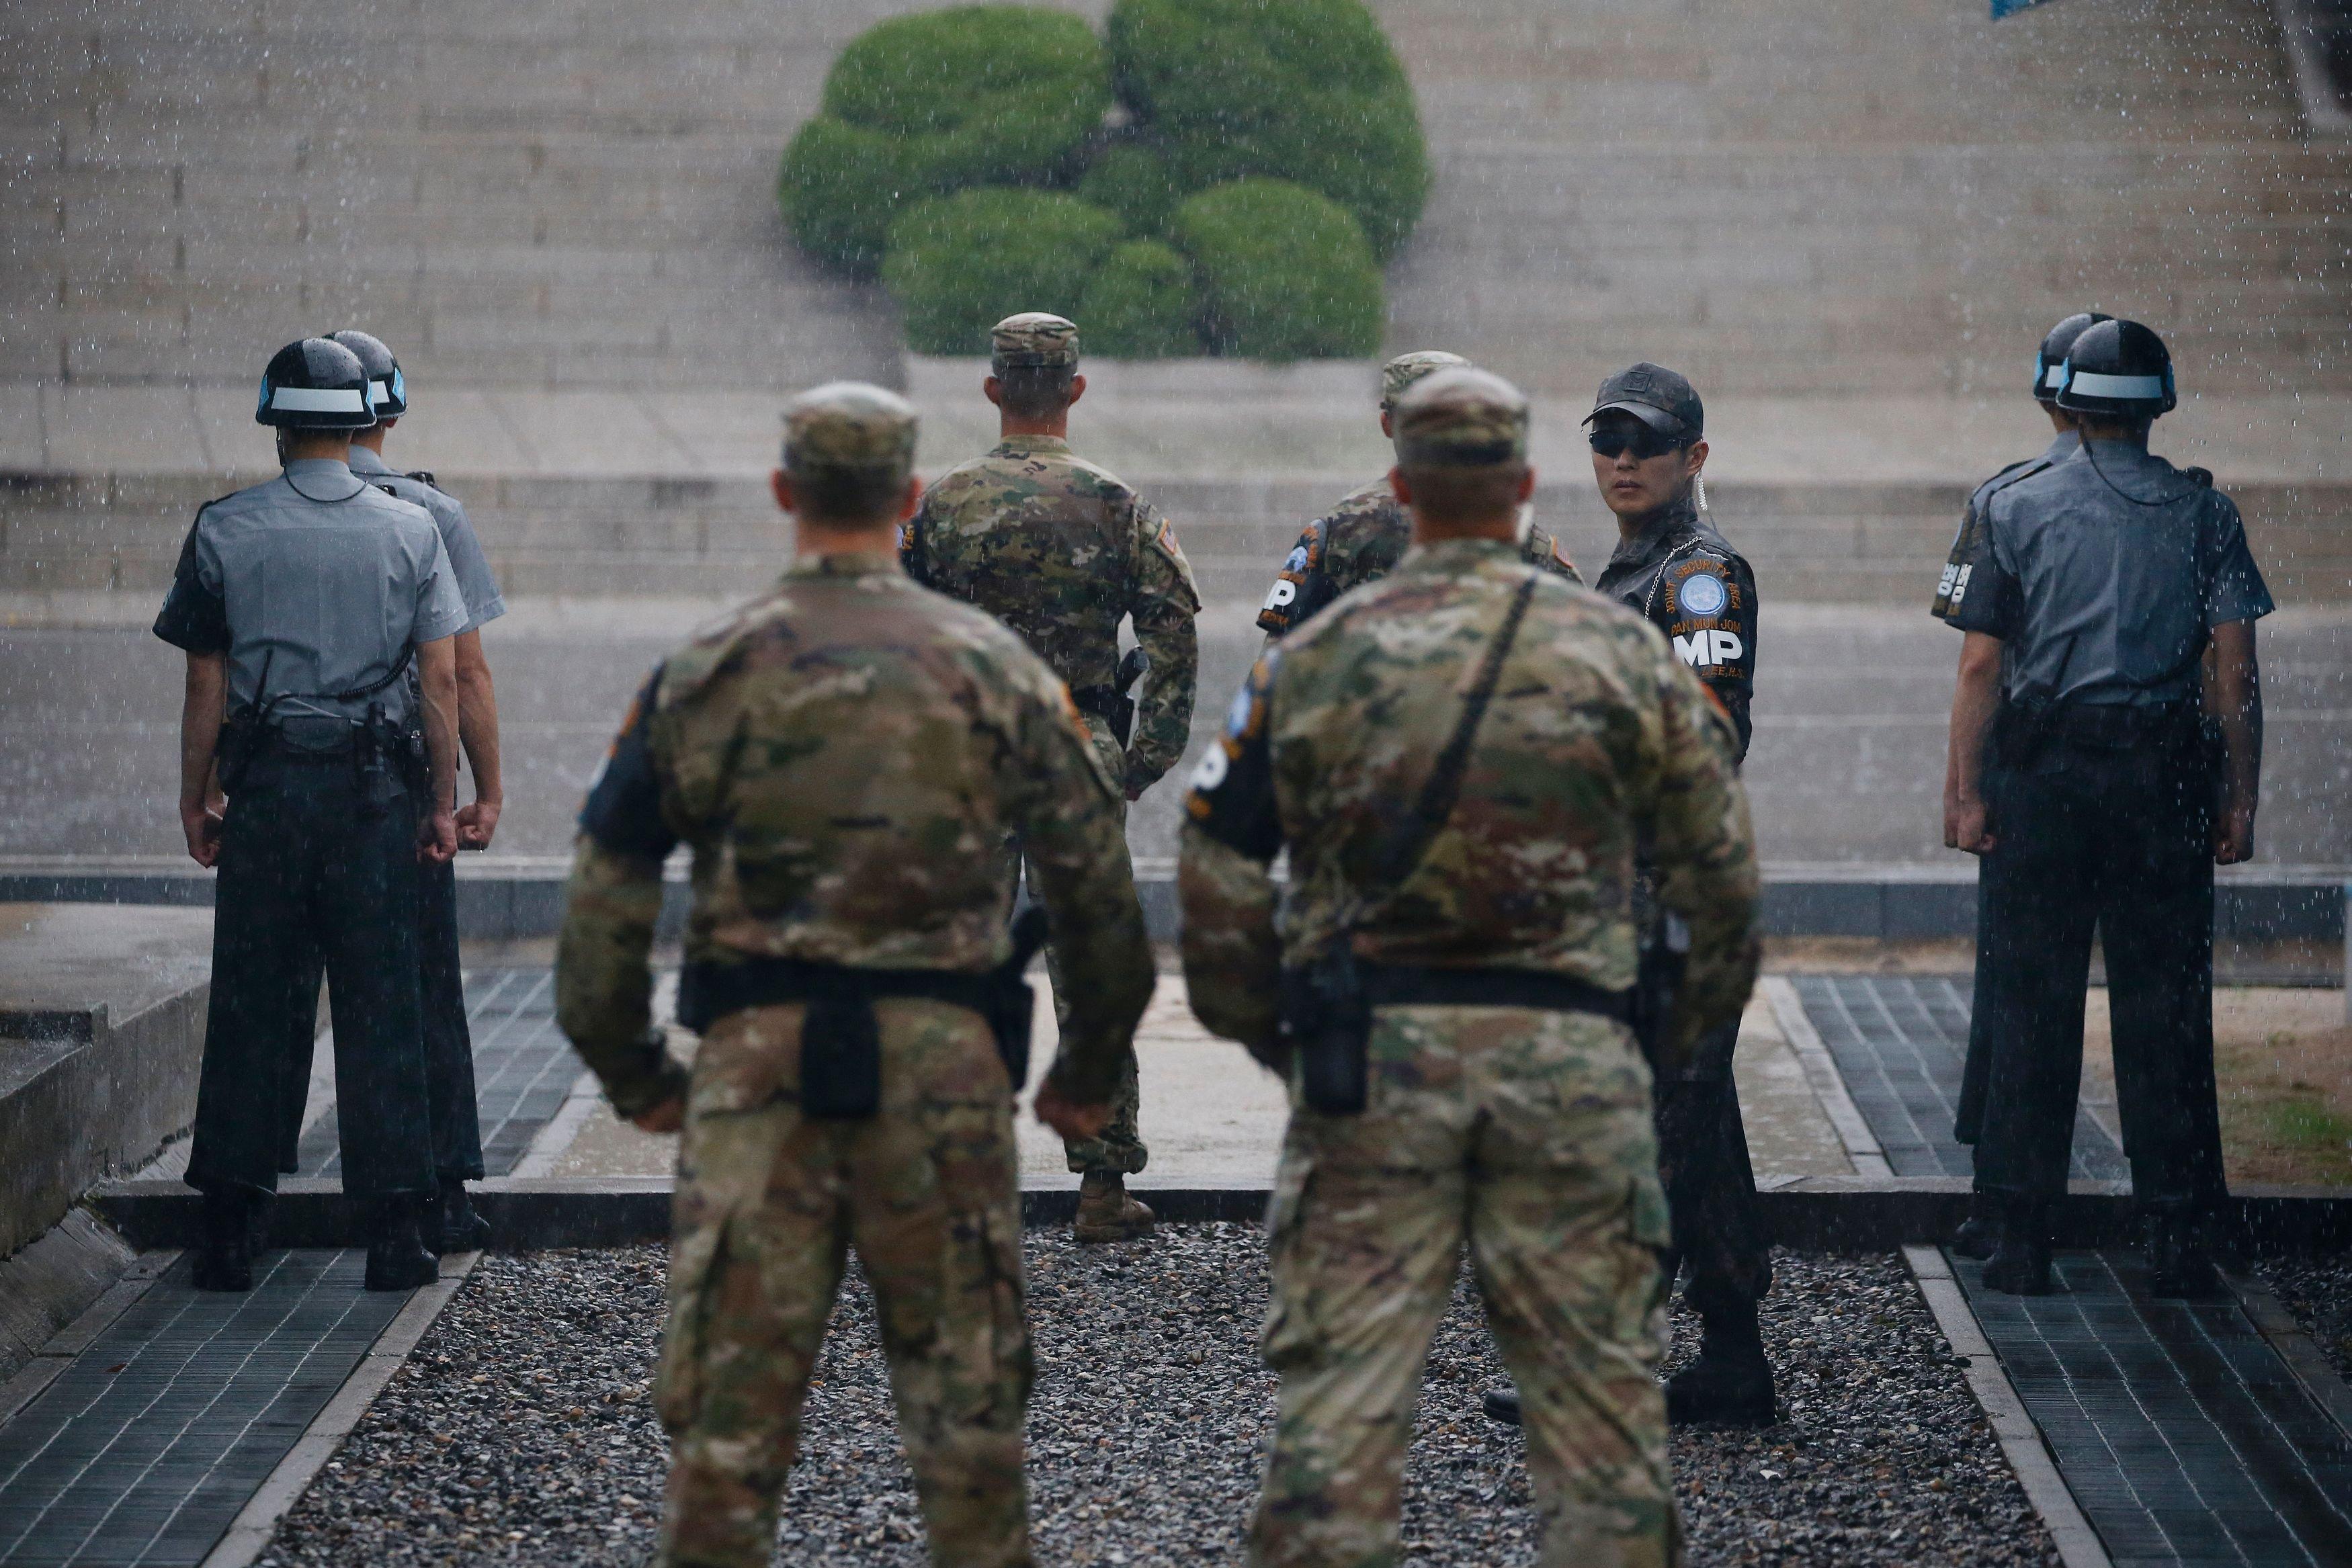 North Korea Defected >> North Korean Soldier Makes Rare Defection Across DMZ to South